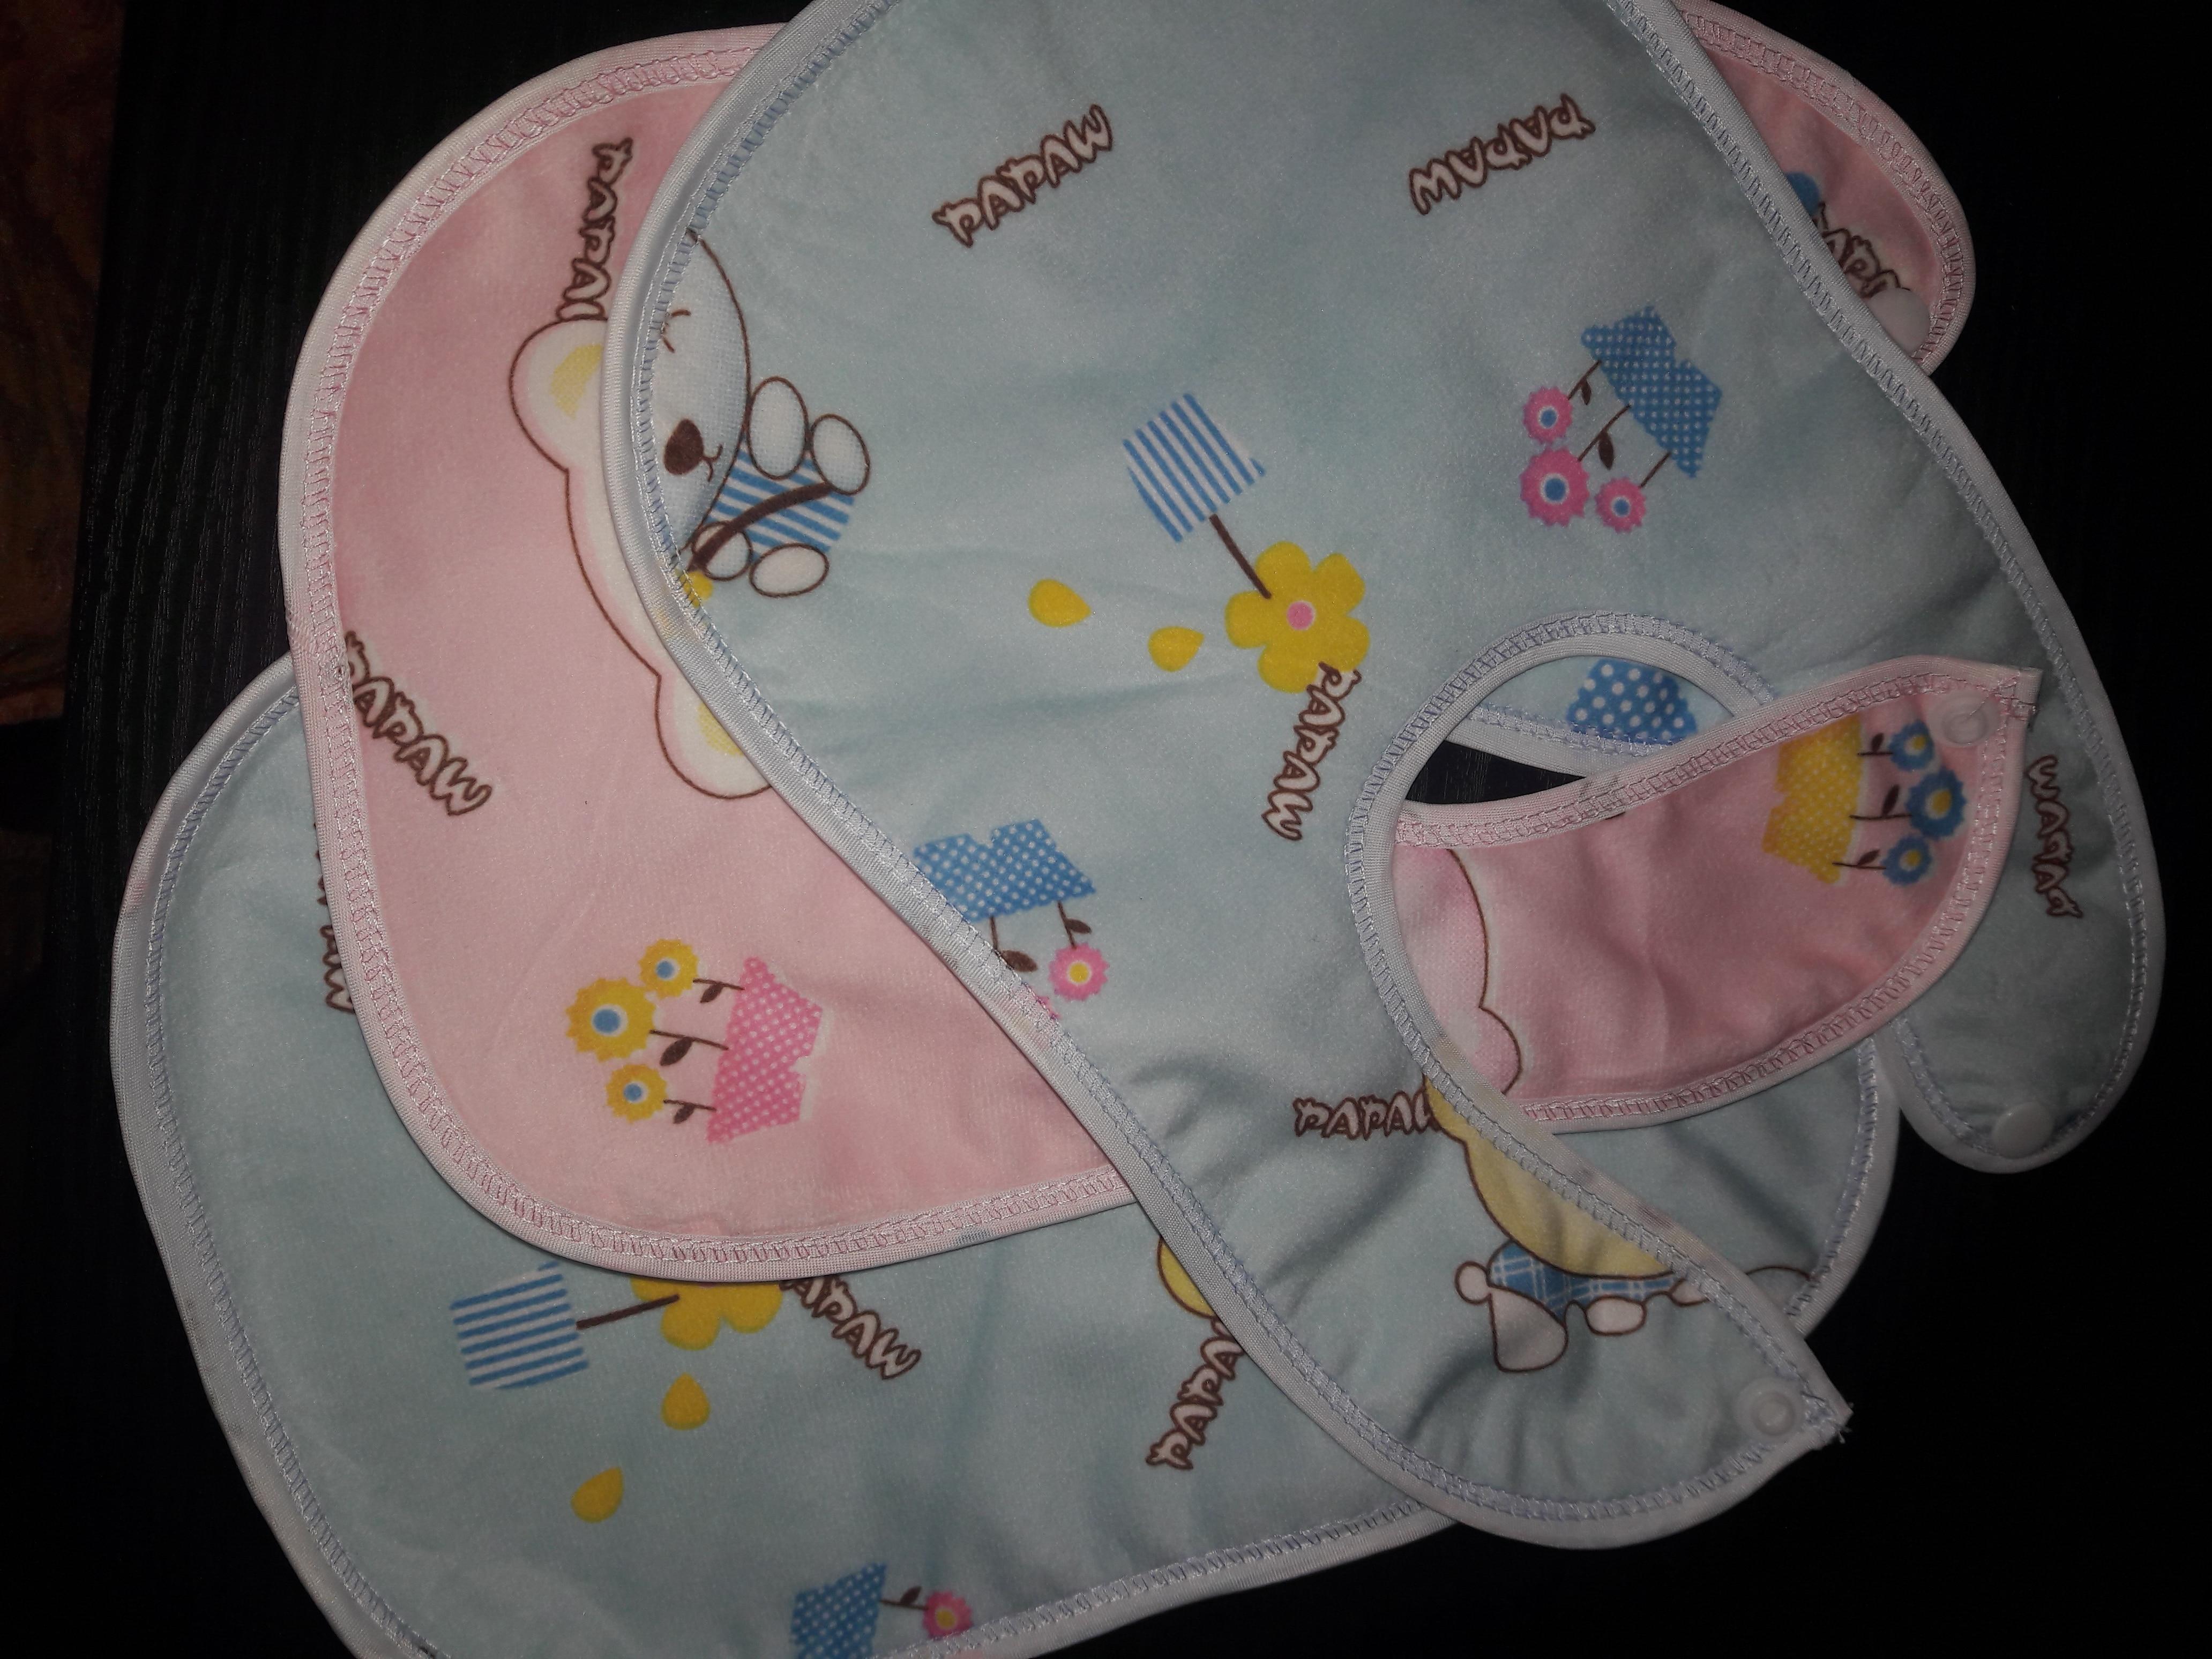 Babygo Waterproof Baby Apron with Bib-Babygo-By rajeswaritcode